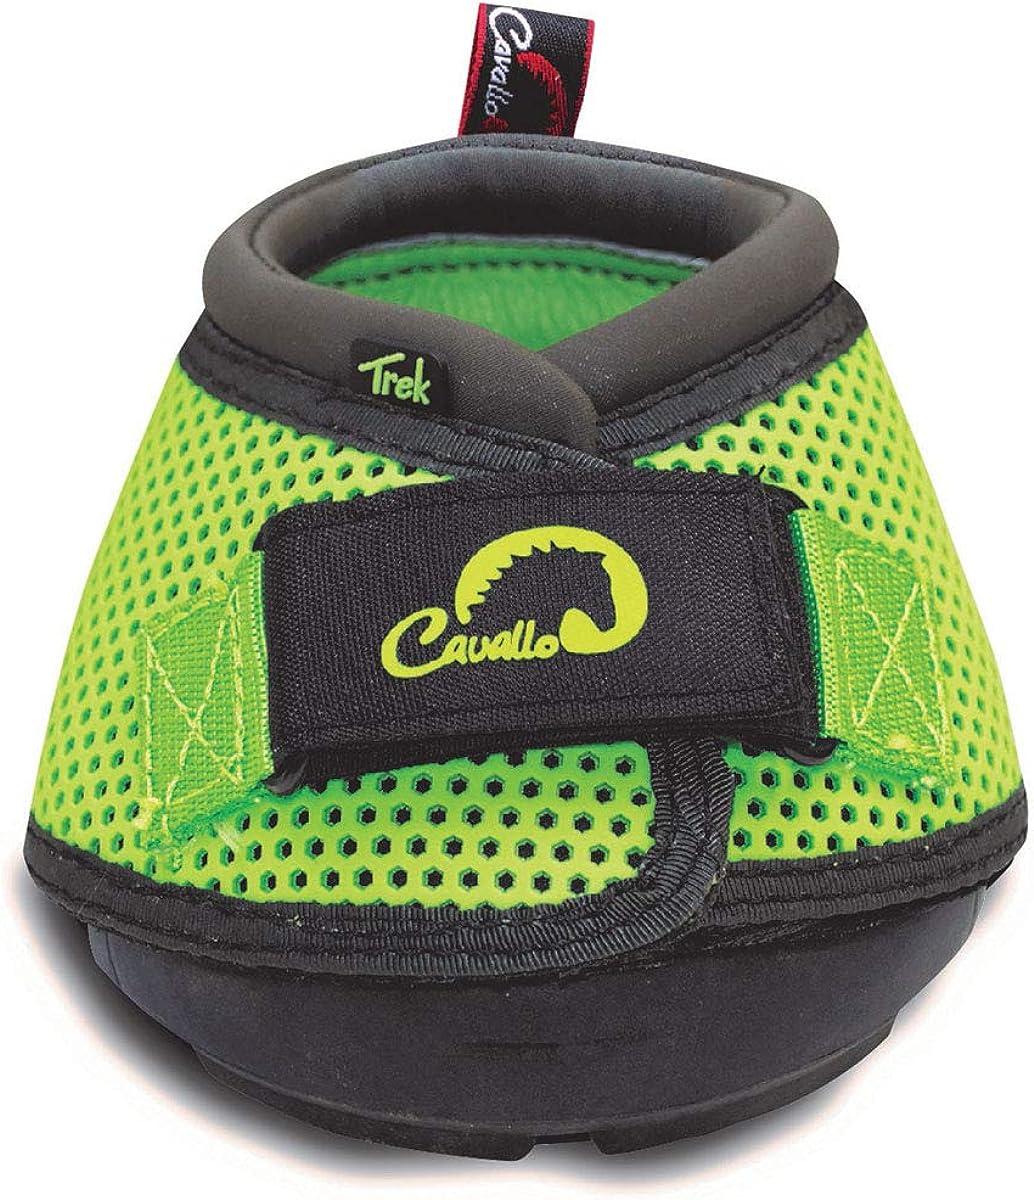 Cavallo - Zapato de suela regular con cierre adhesivo modelo Trek para caballo